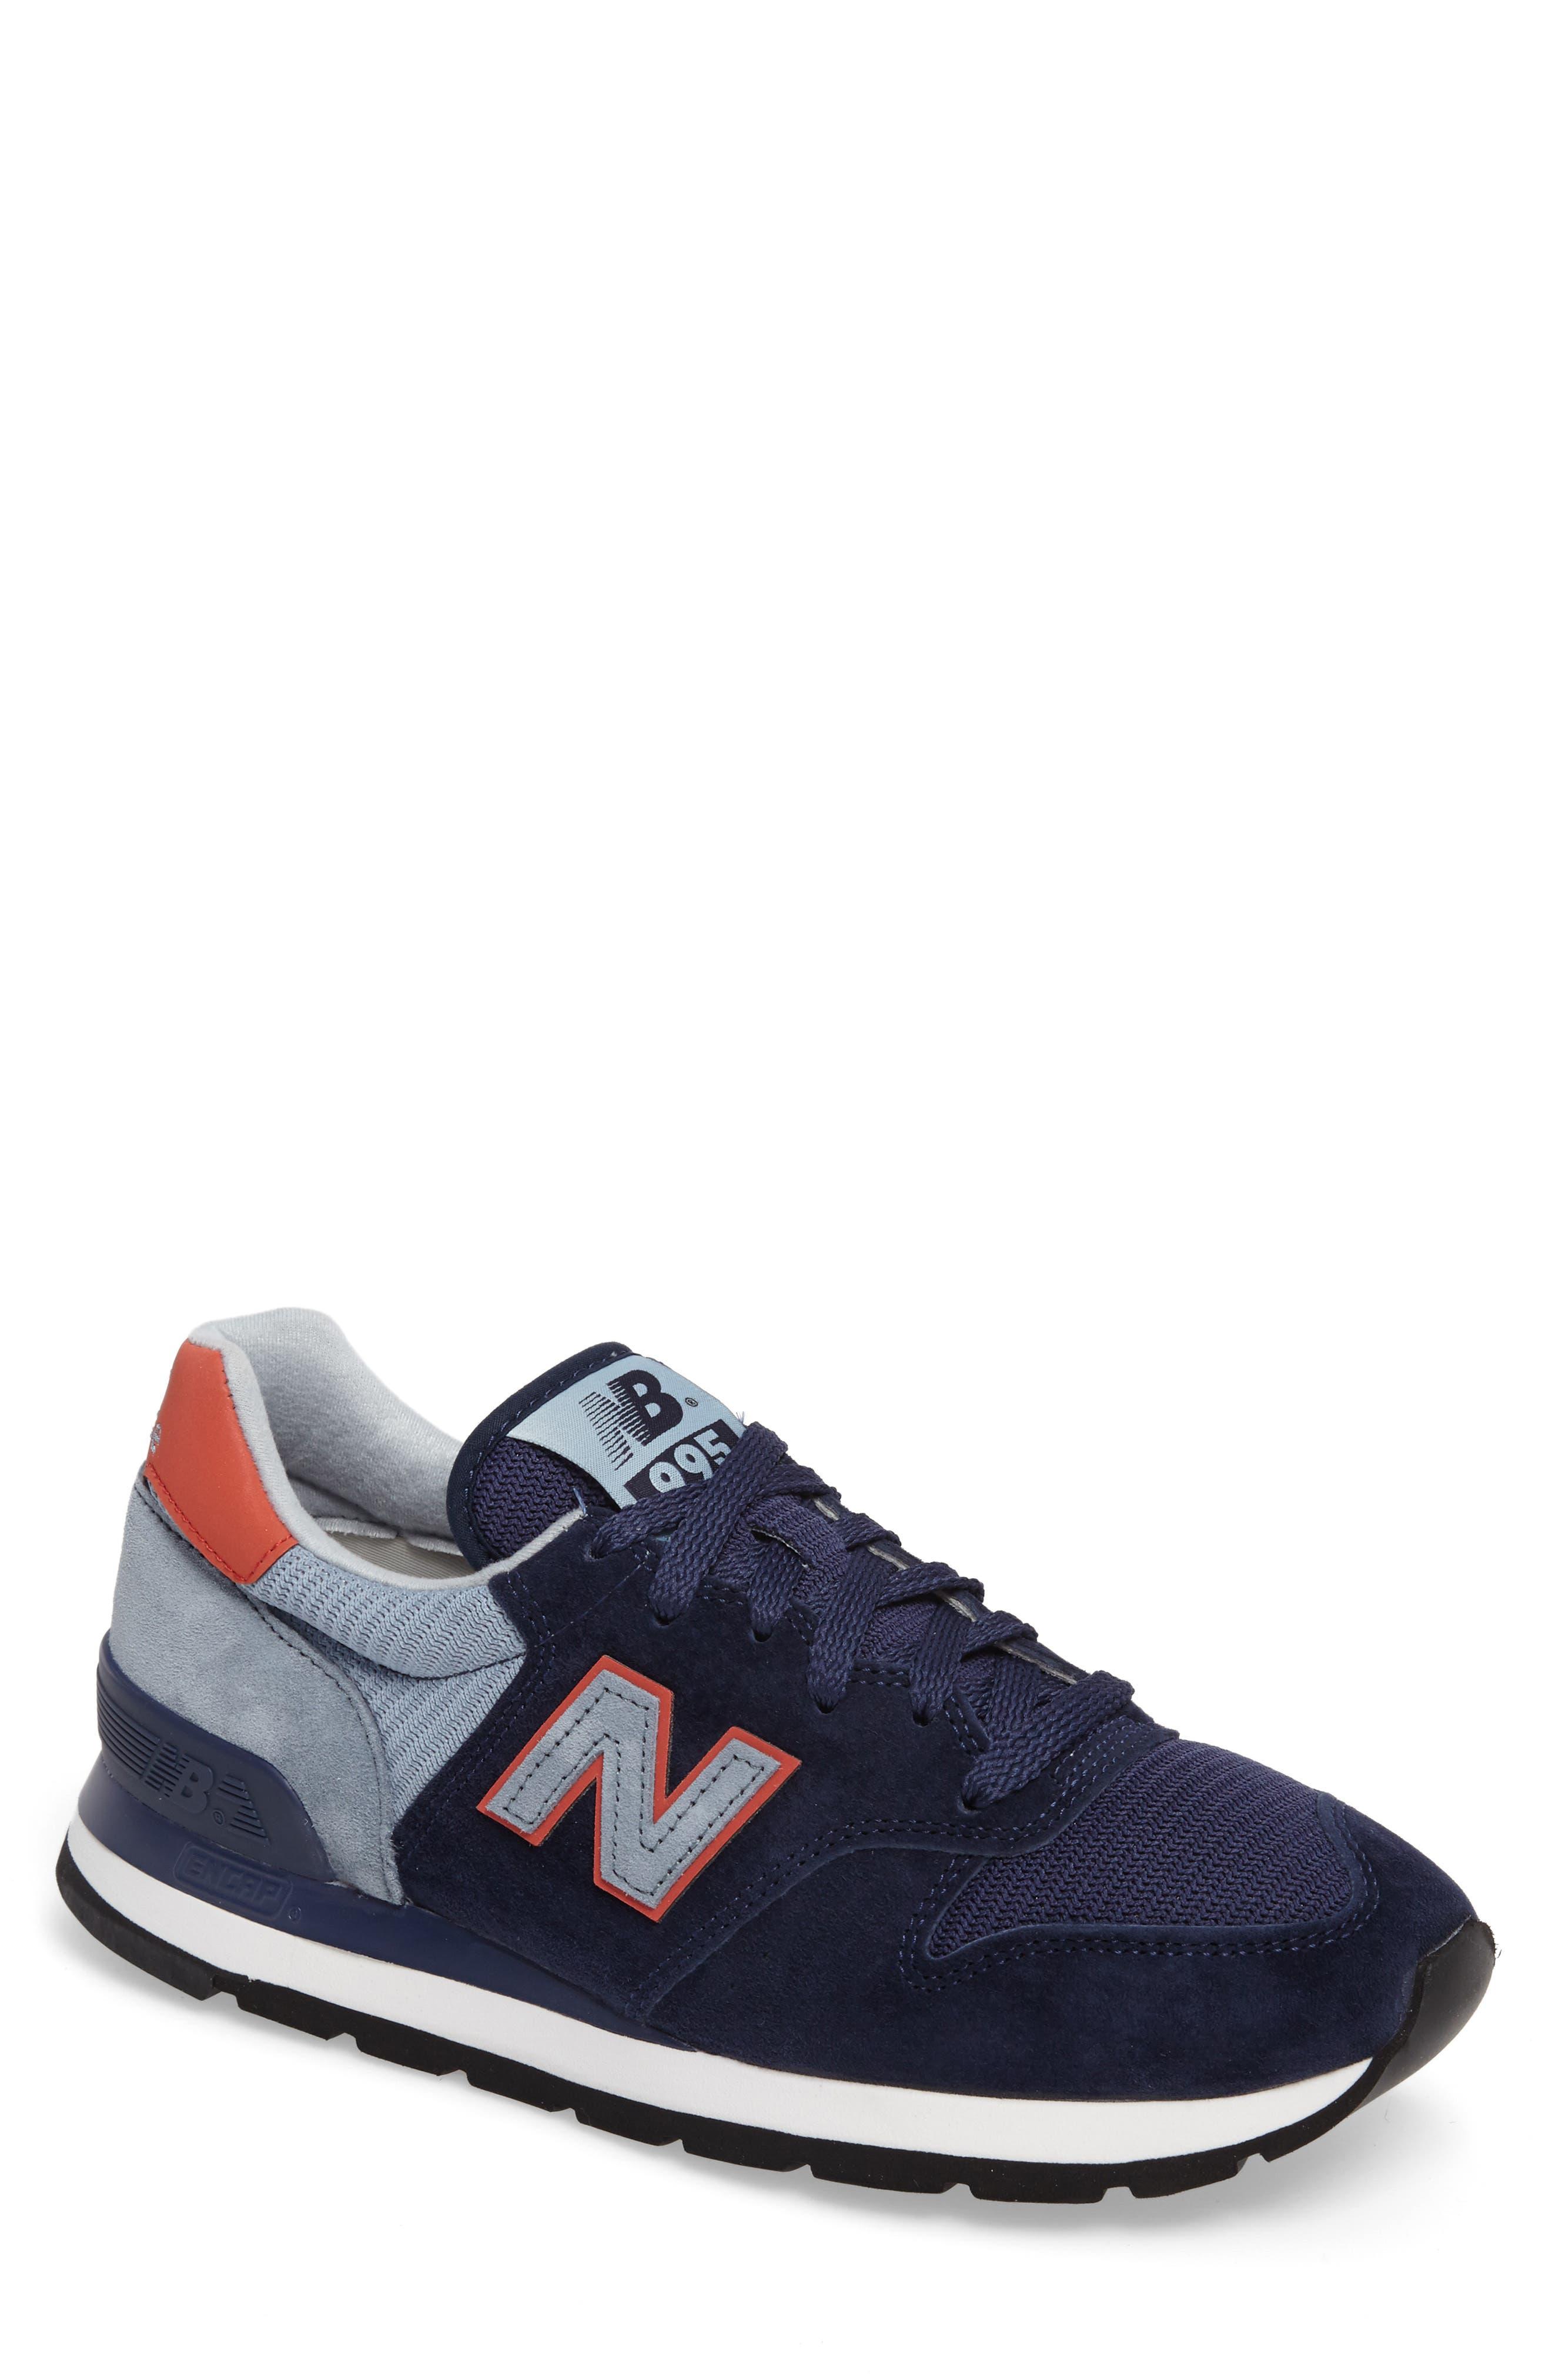 995 Sneaker,                             Main thumbnail 1, color,